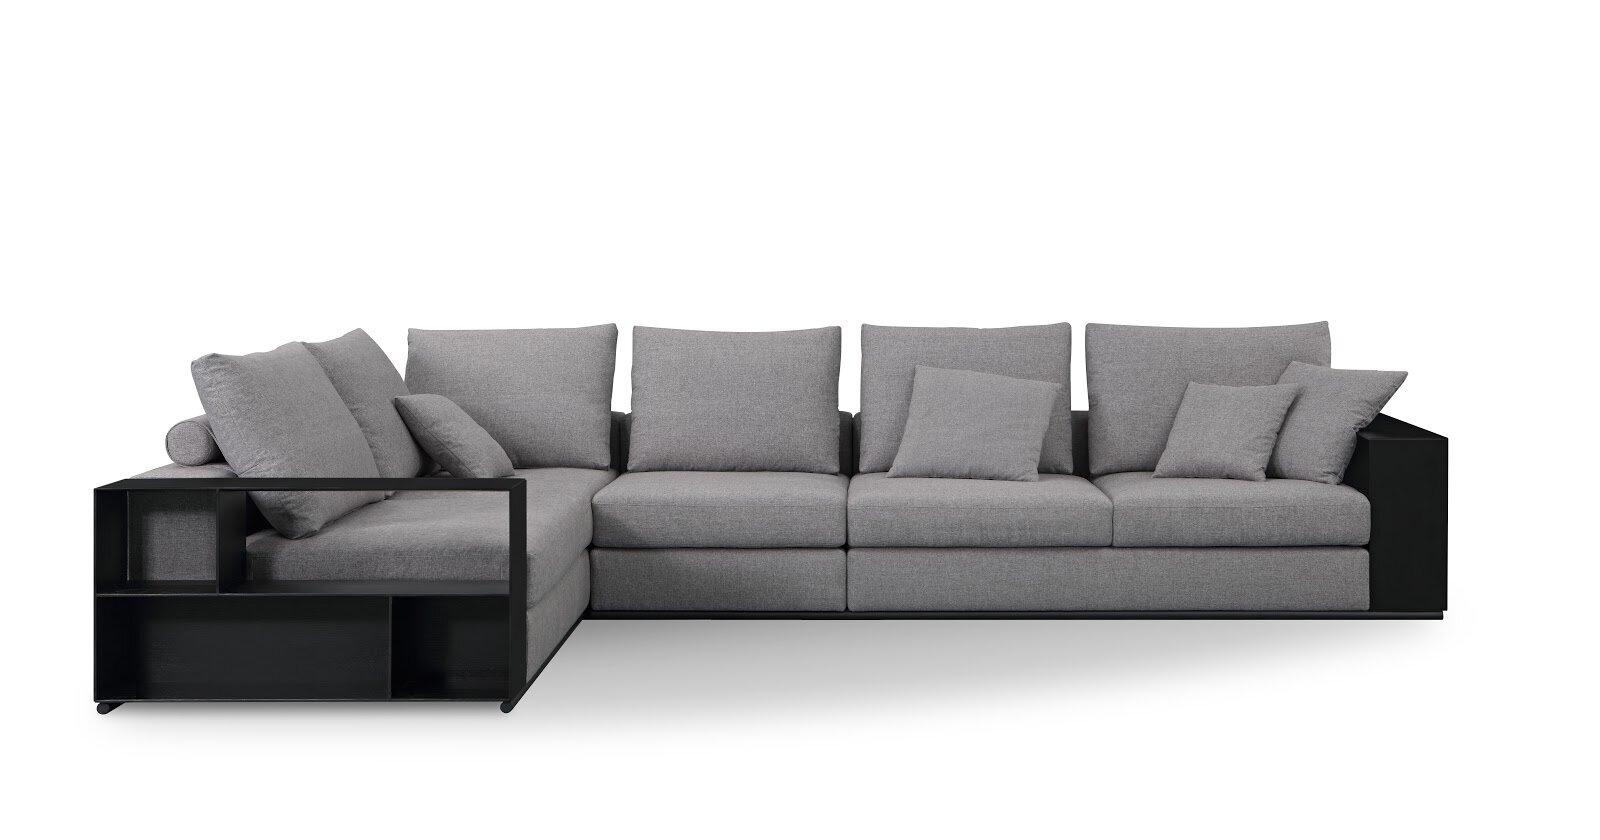 Swell Guelph Left Hand Facing Modular Sectional Creativecarmelina Interior Chair Design Creativecarmelinacom